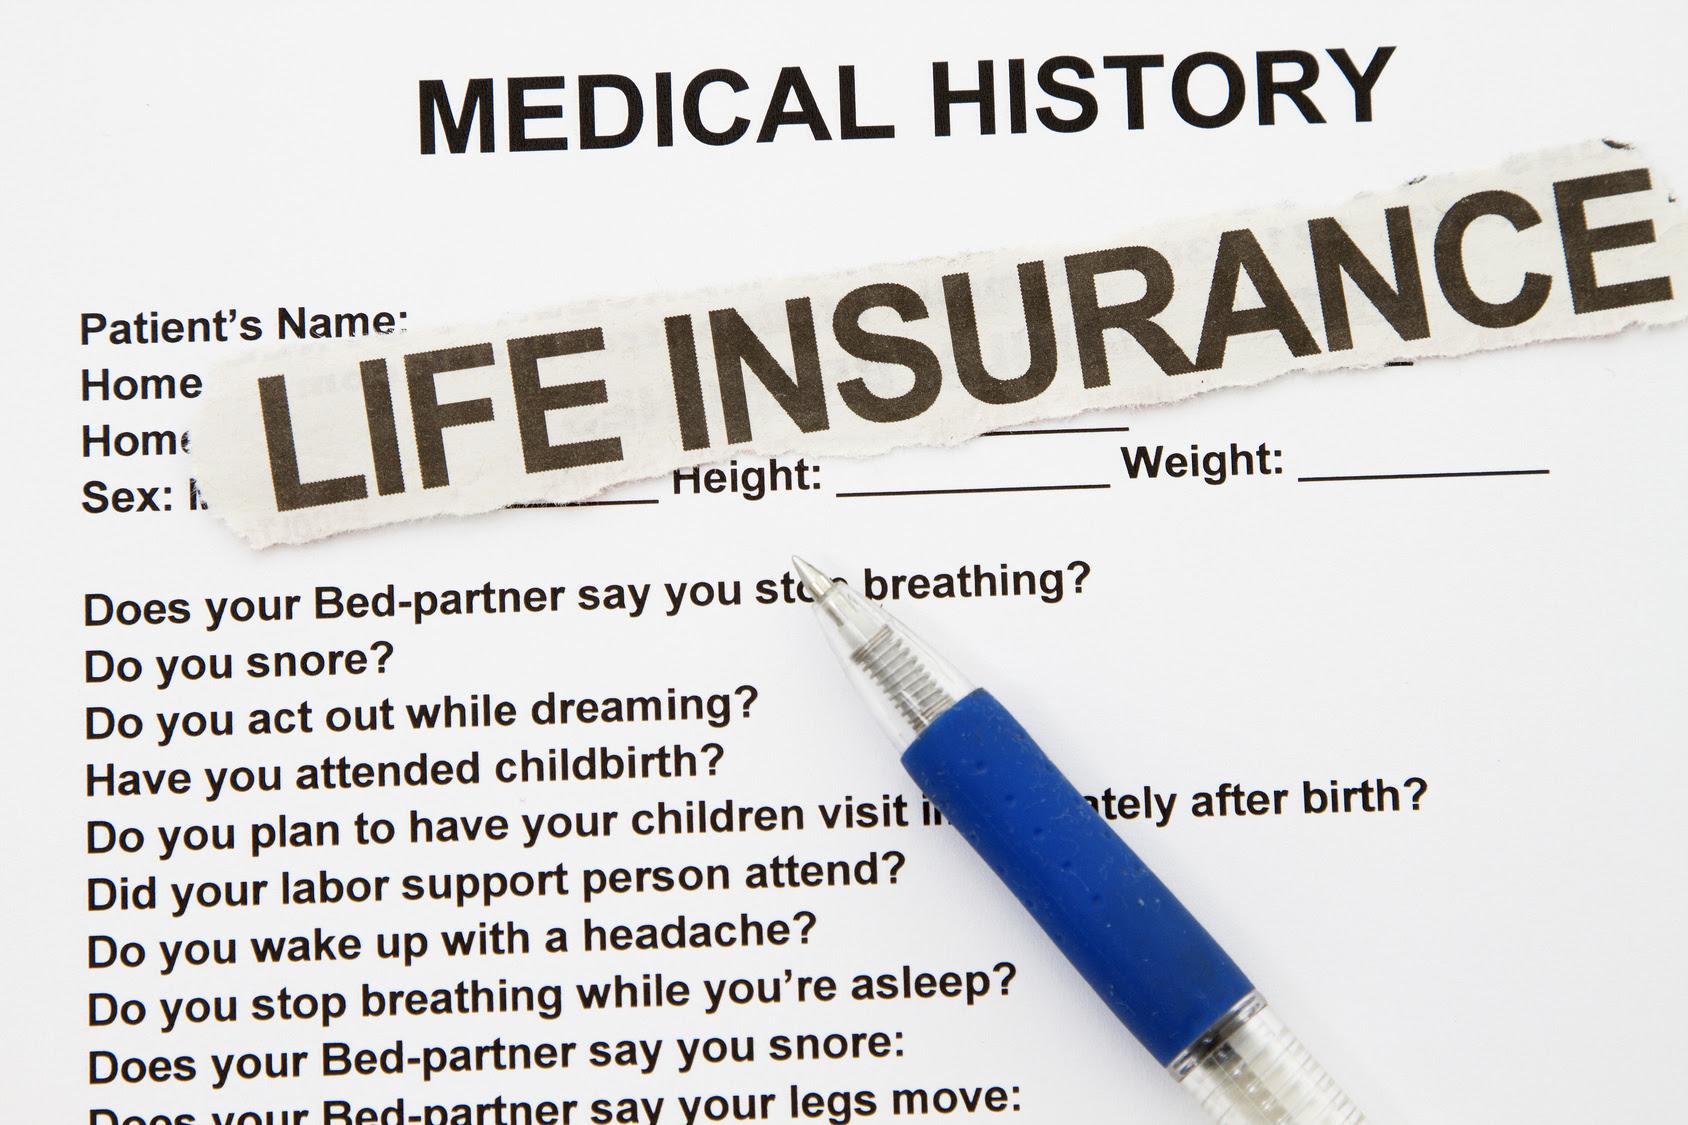 Pleasant Hill Life Insurance